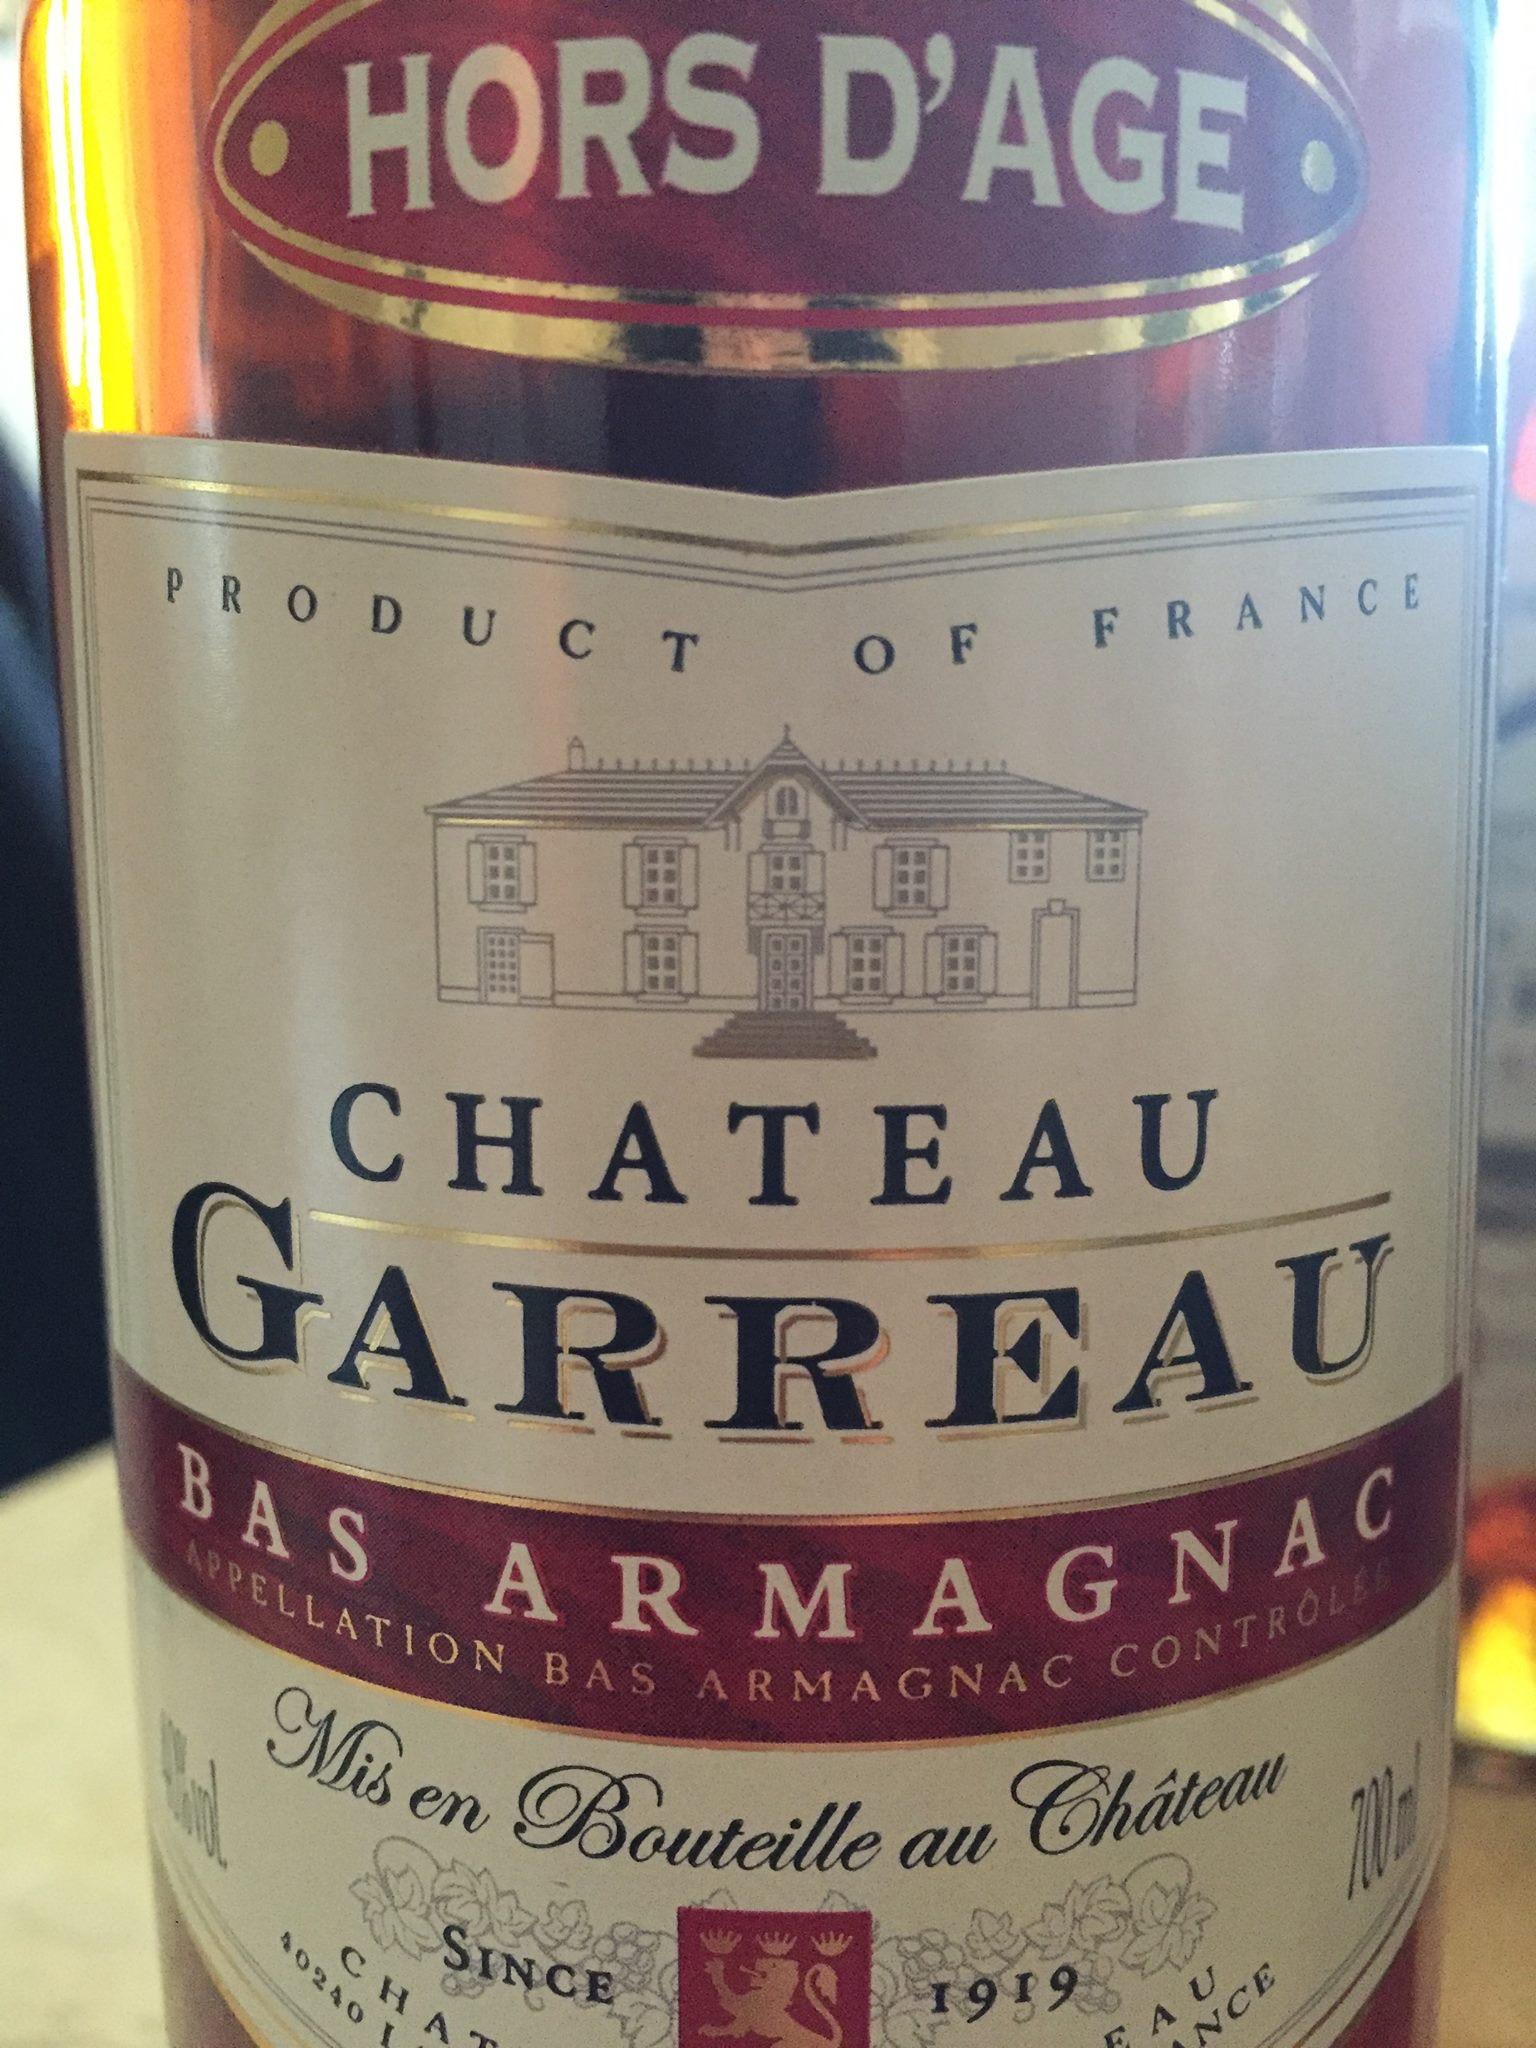 Château Garreau – HORS D'AGE – Bas-Armagnac